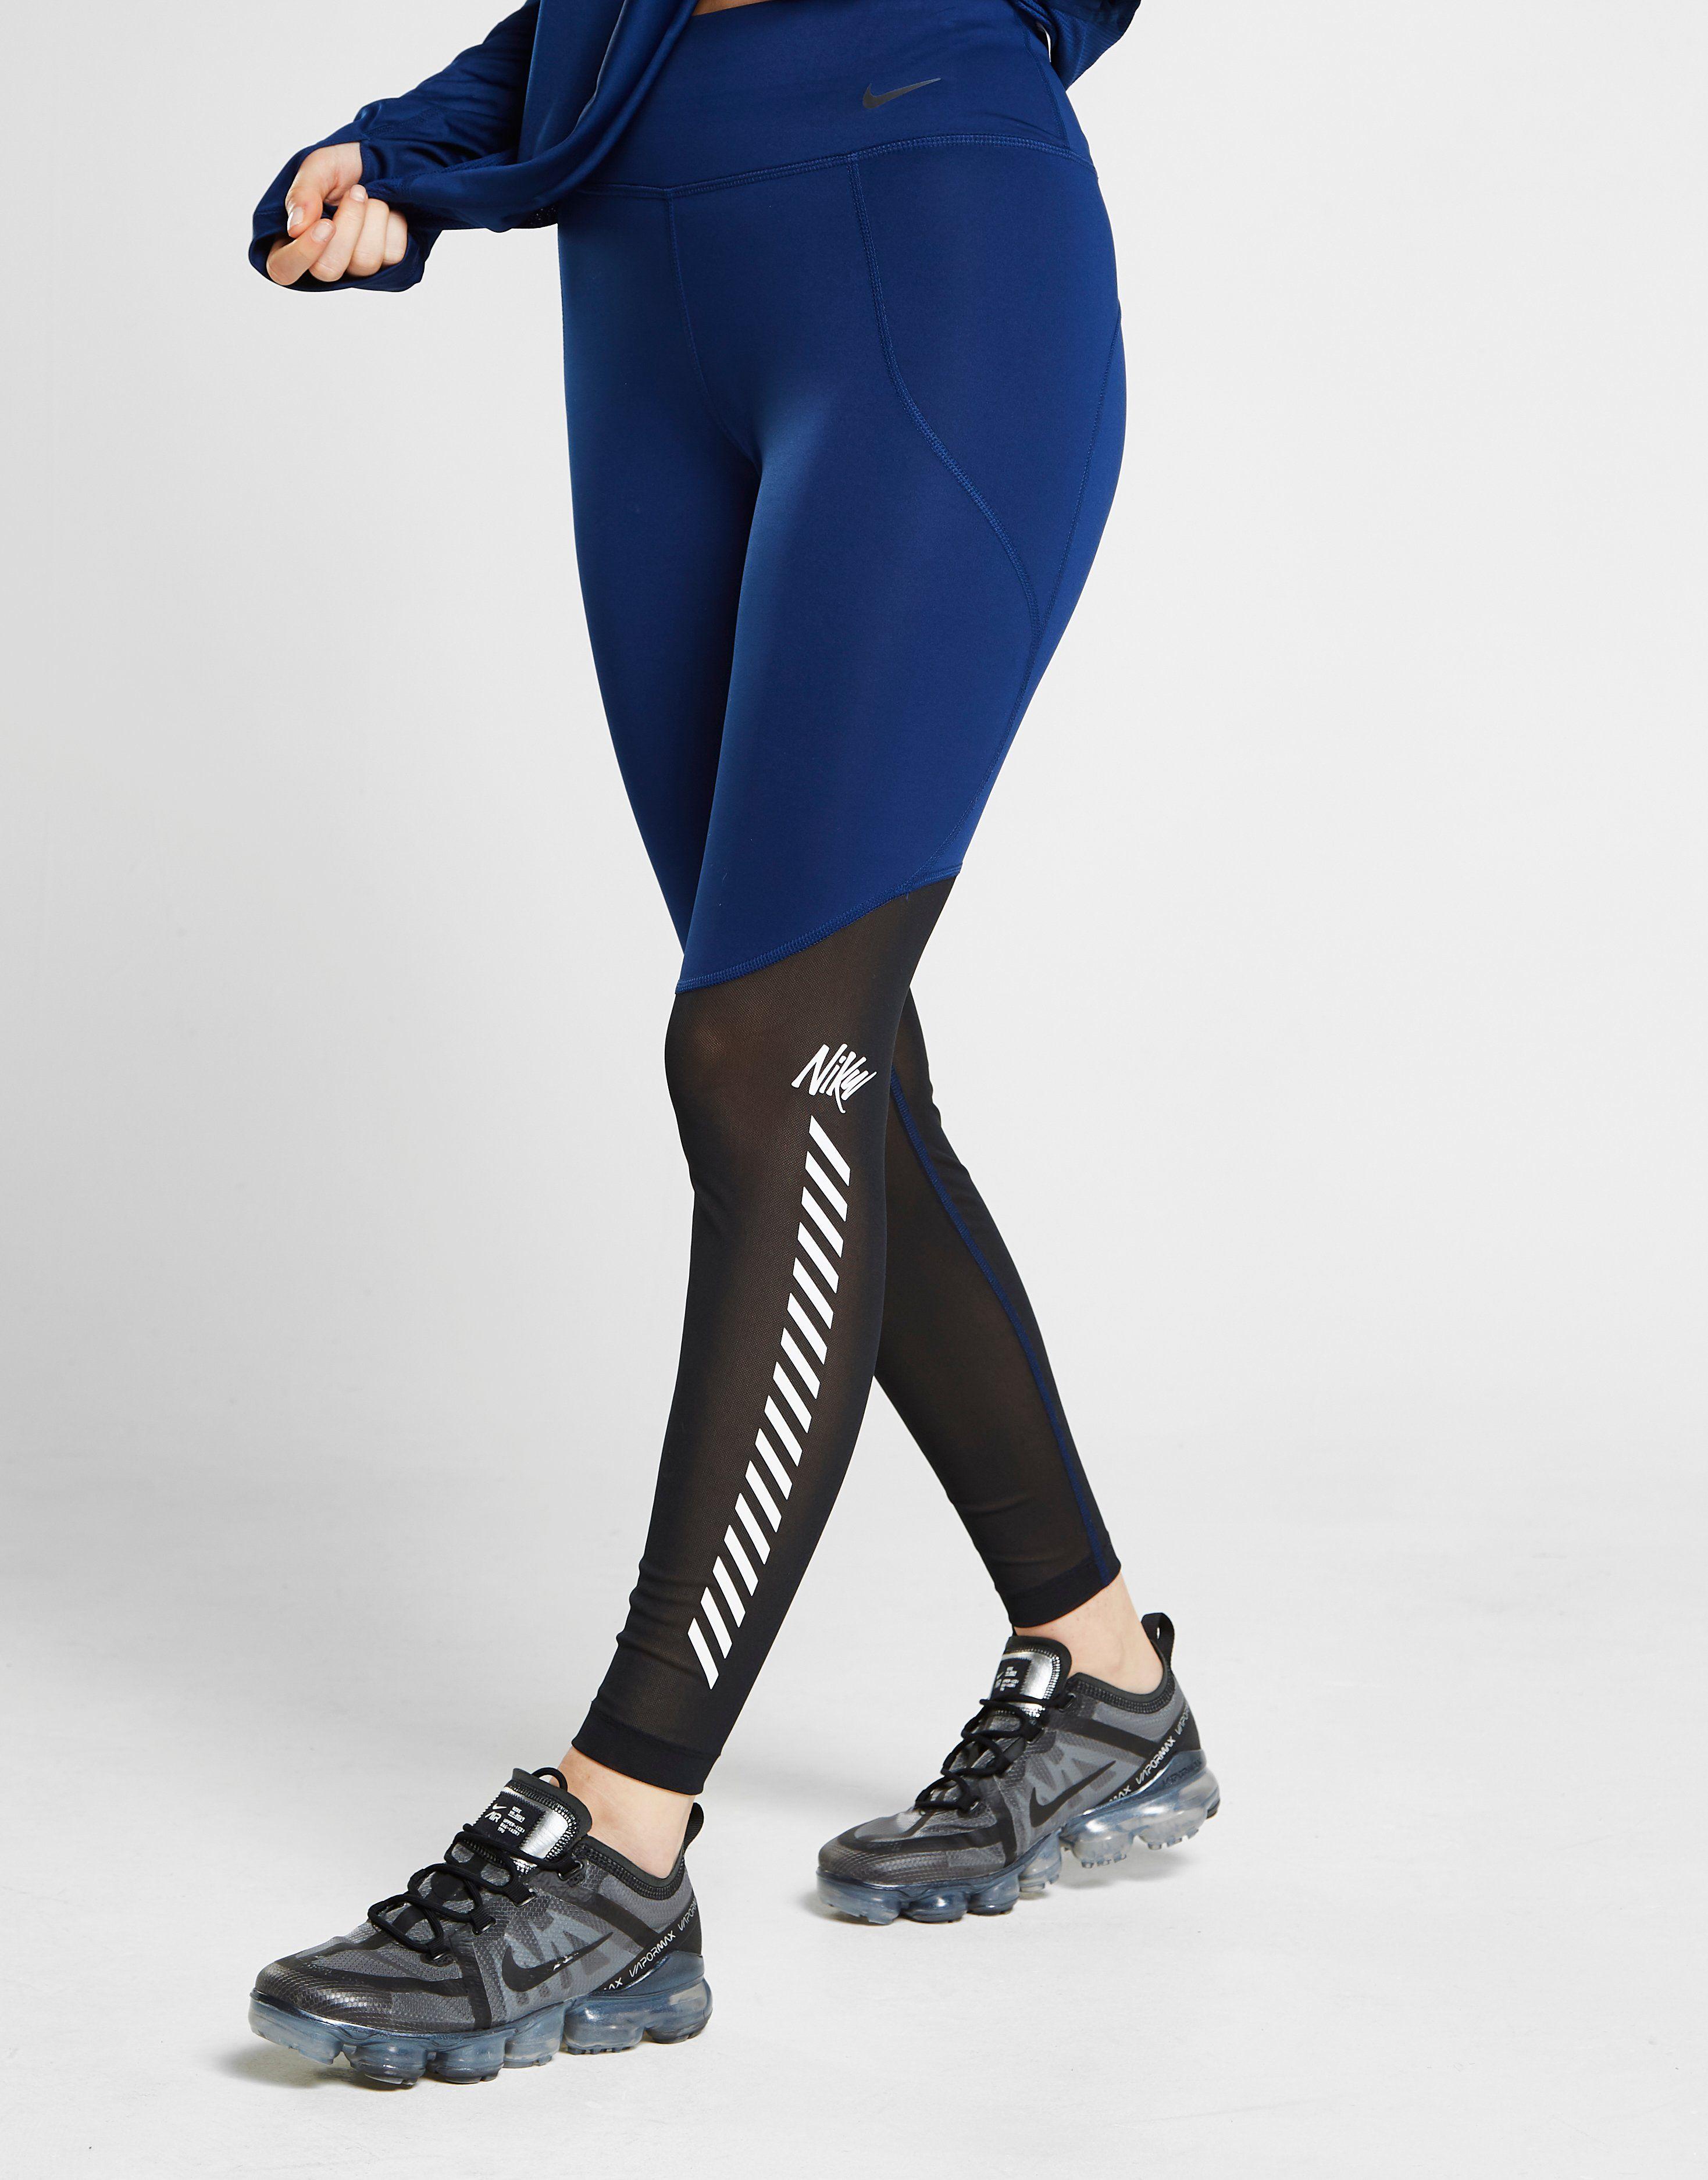 Nike Training Sport Tights